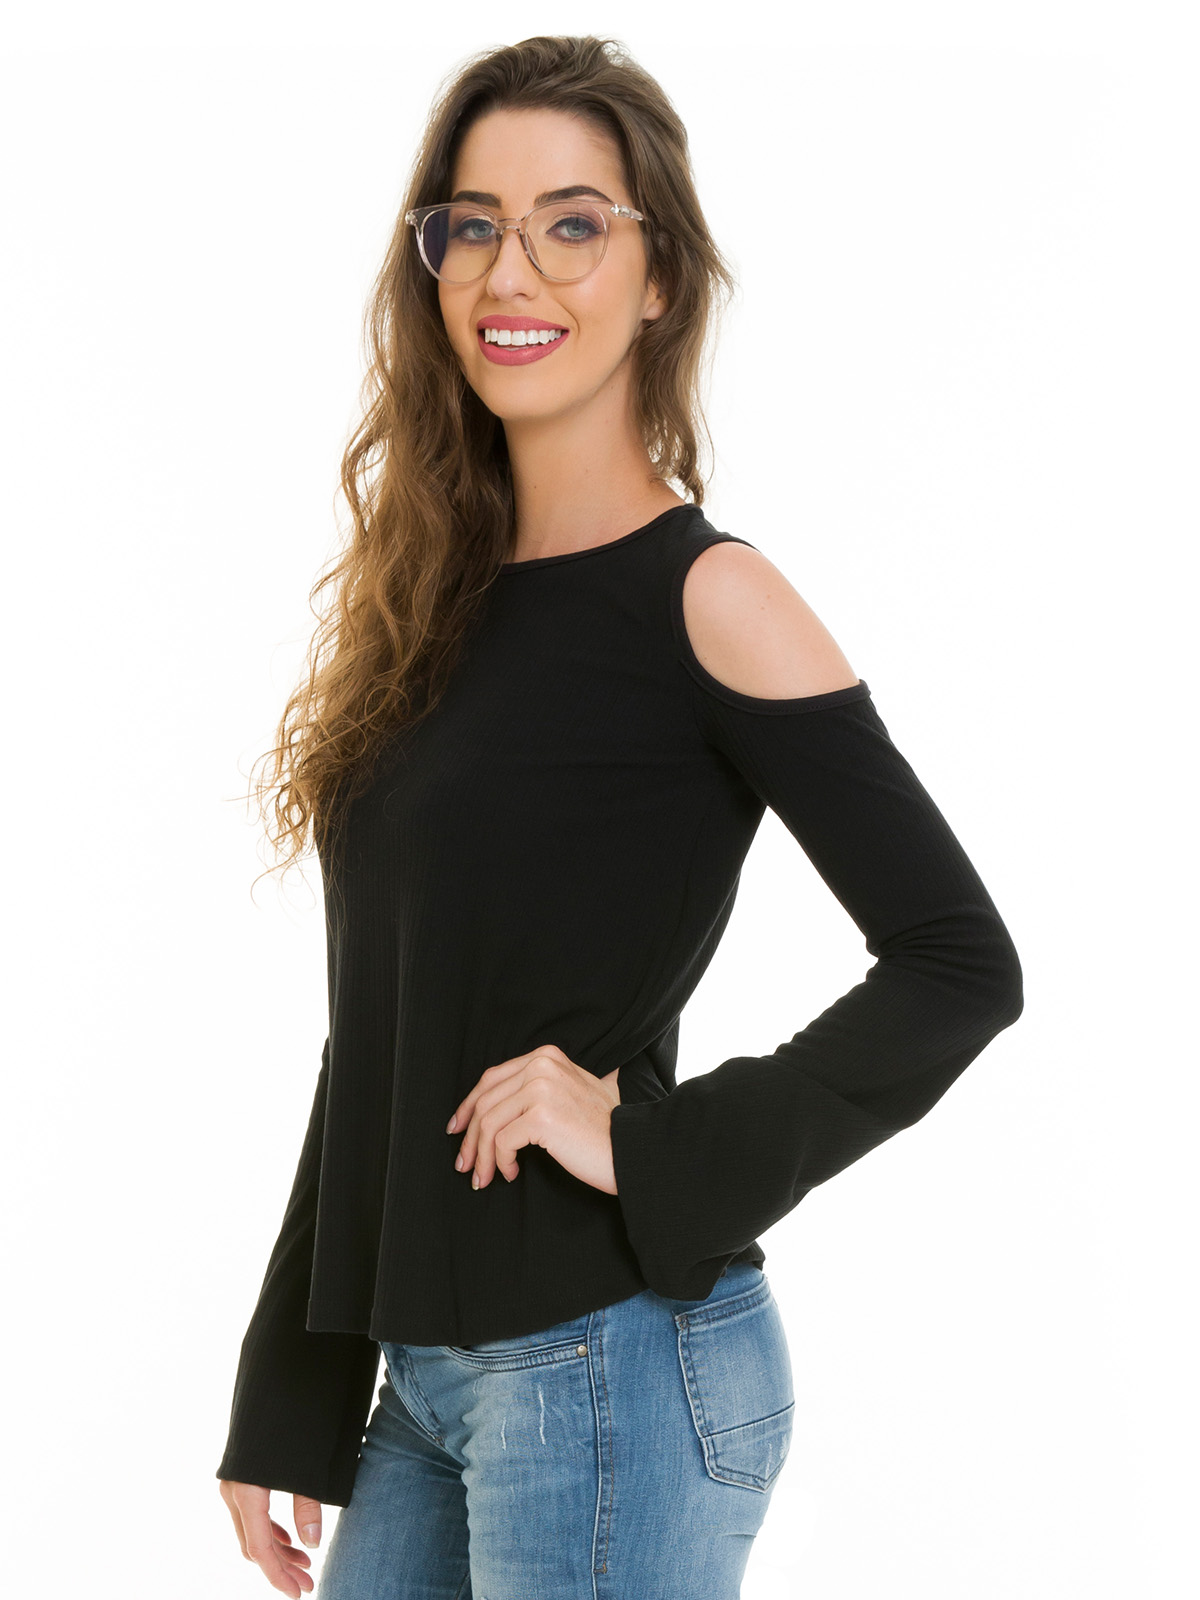 Blusa Canelada manga vazada preto